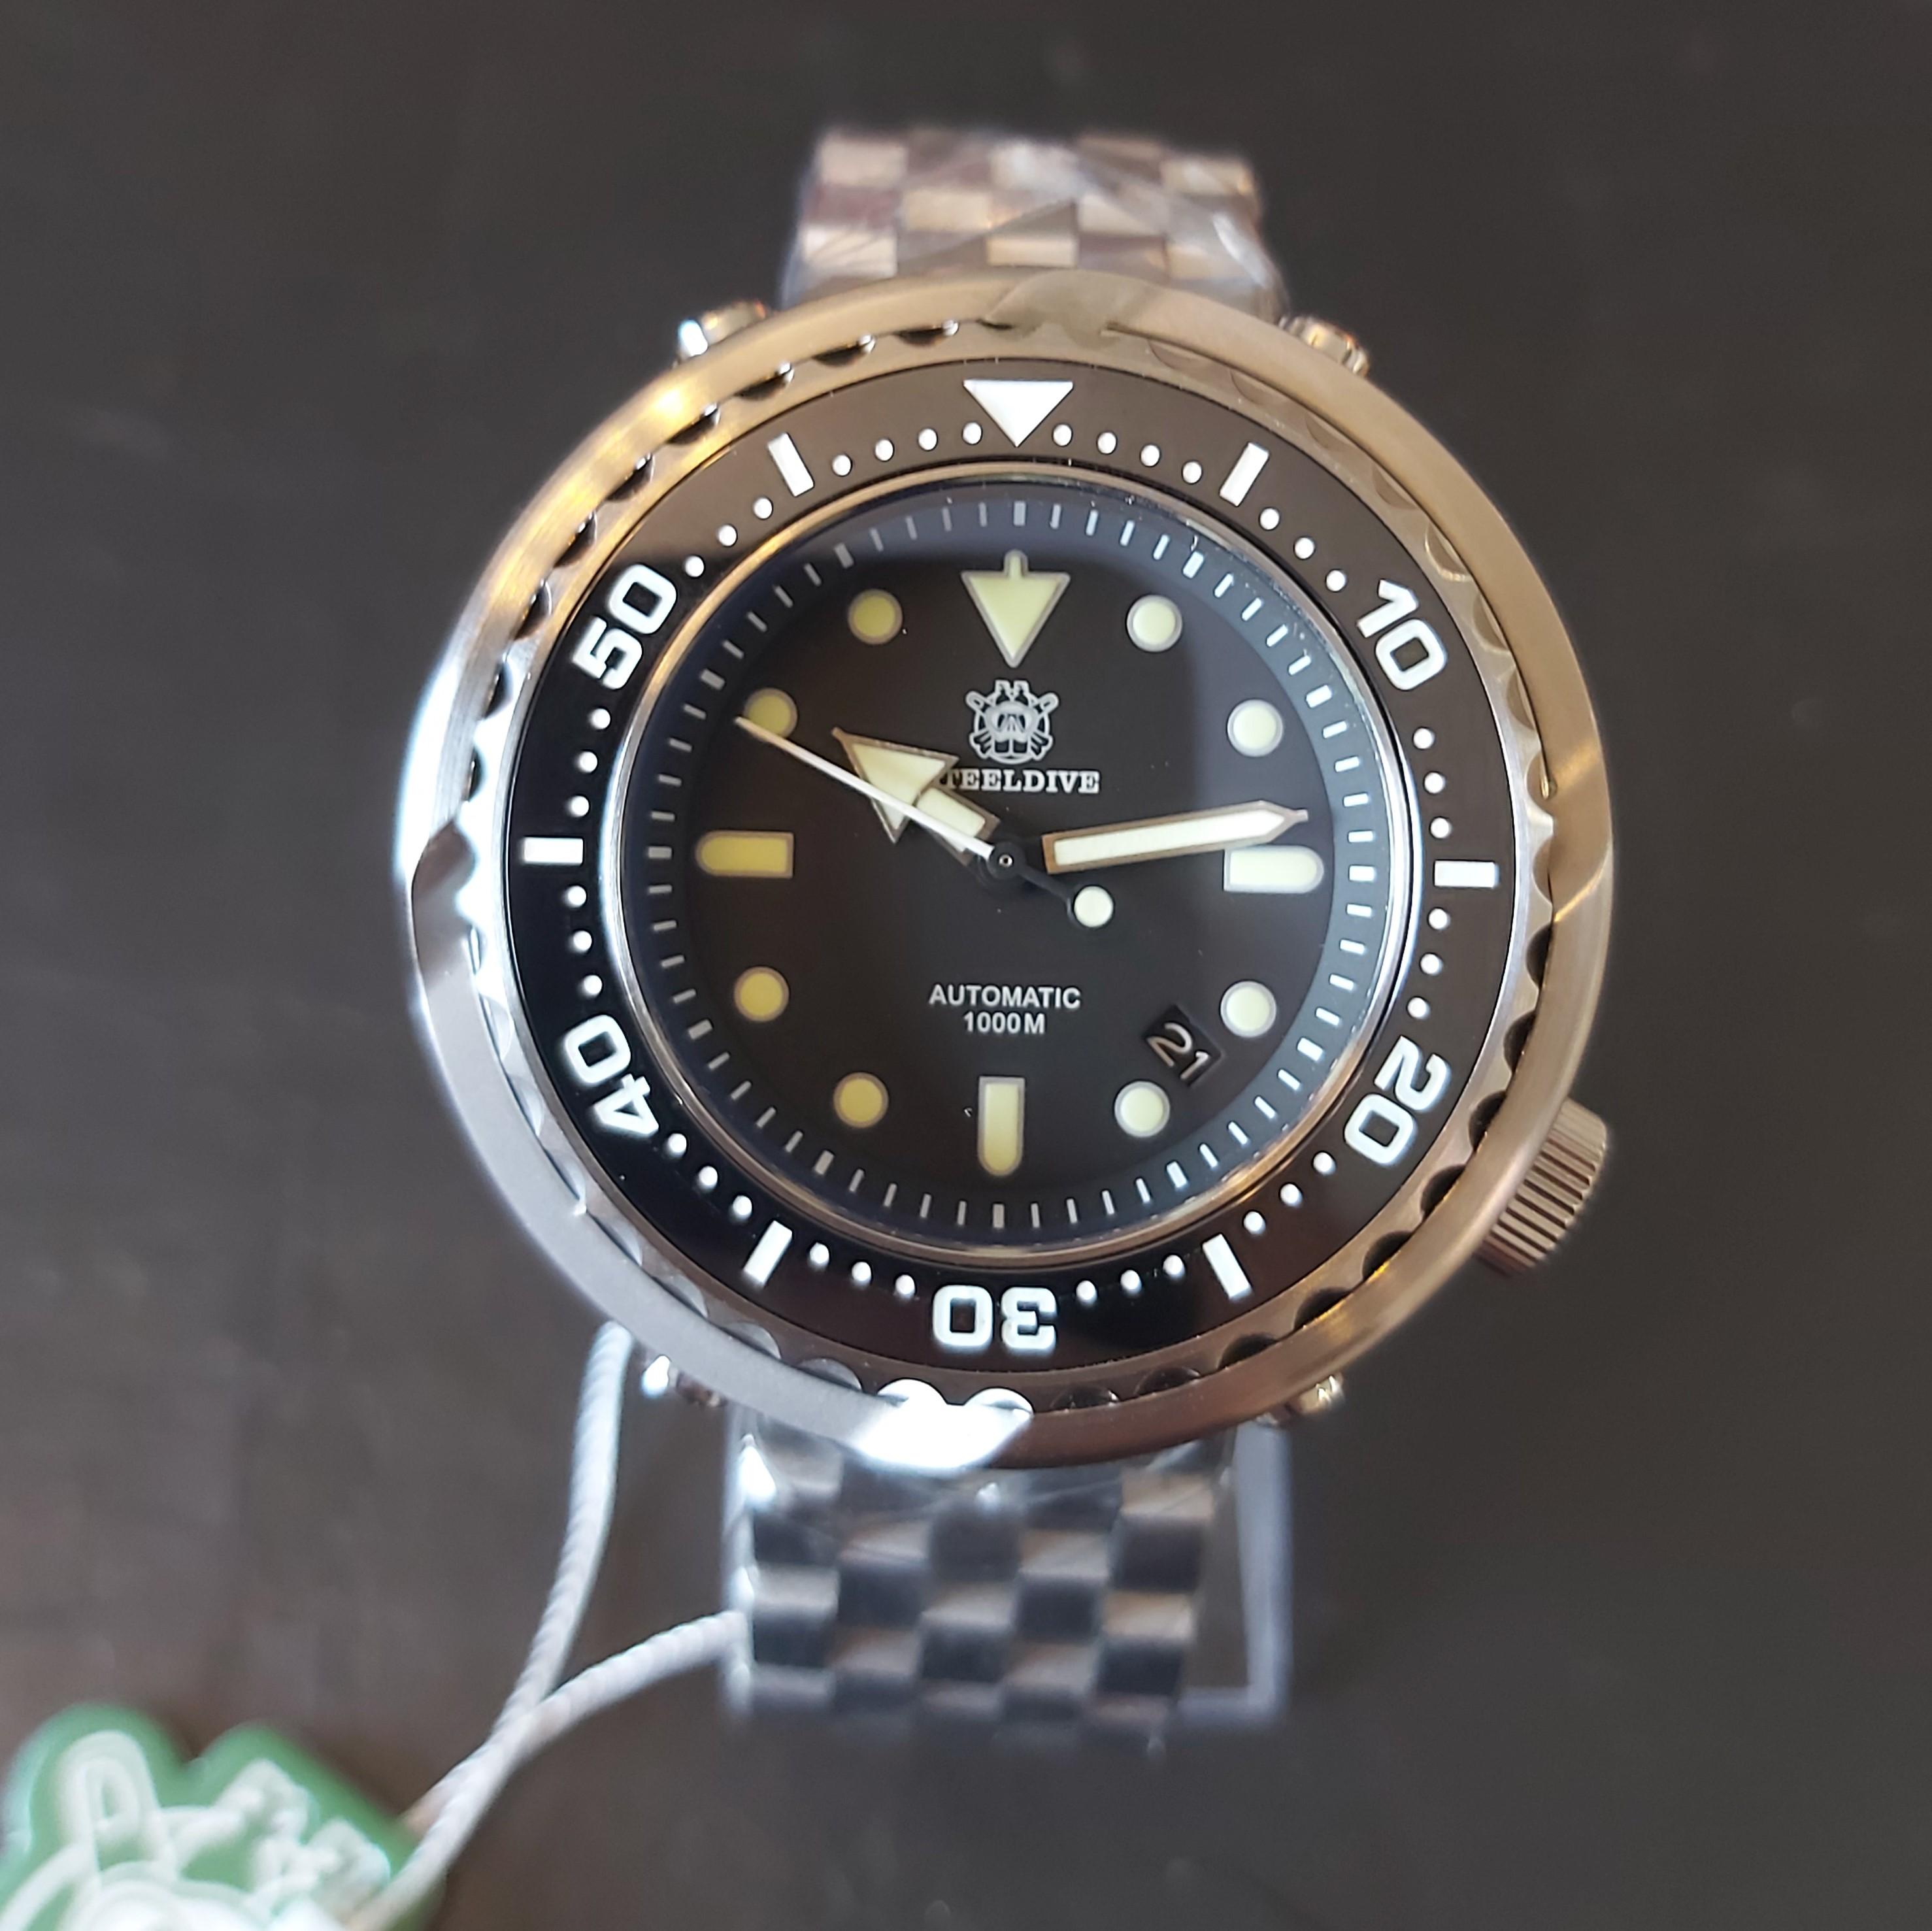 Steeldive SD1978 1000m EMPEROR TUNA Diver's watch